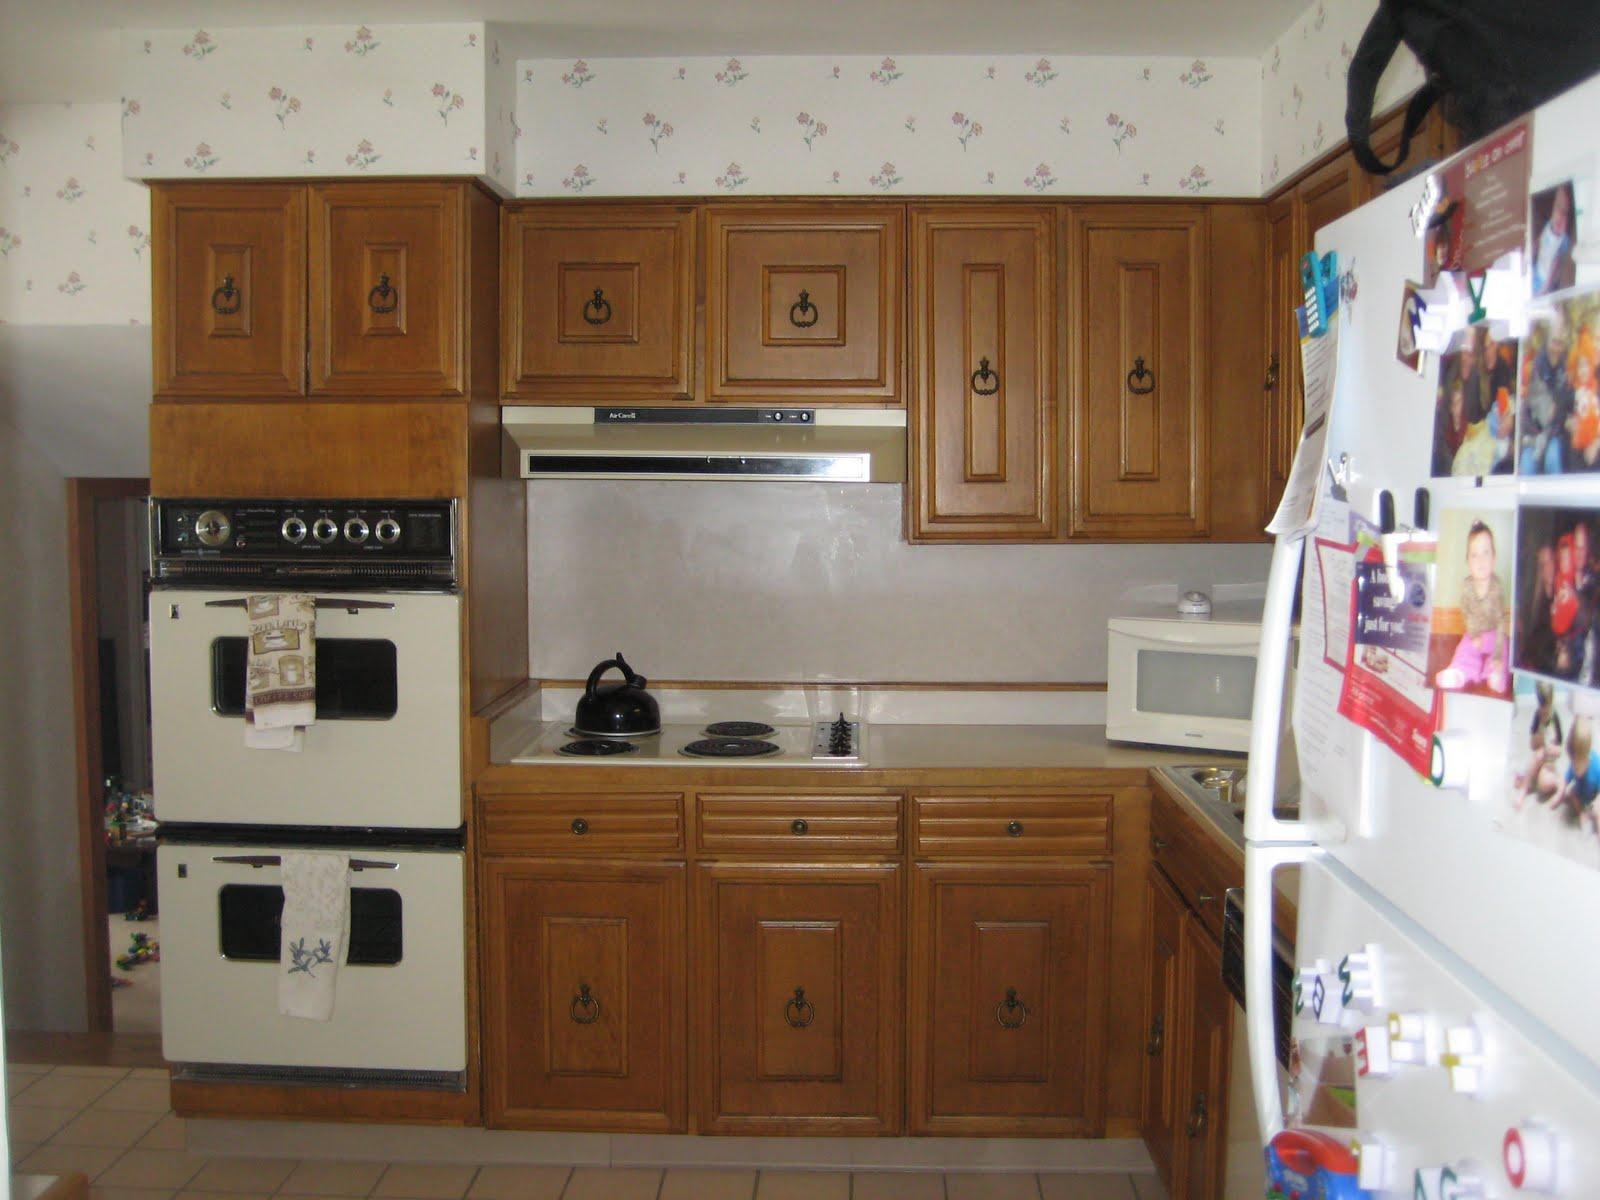 Obssesed With Design The Original Kitchen Circa 1967